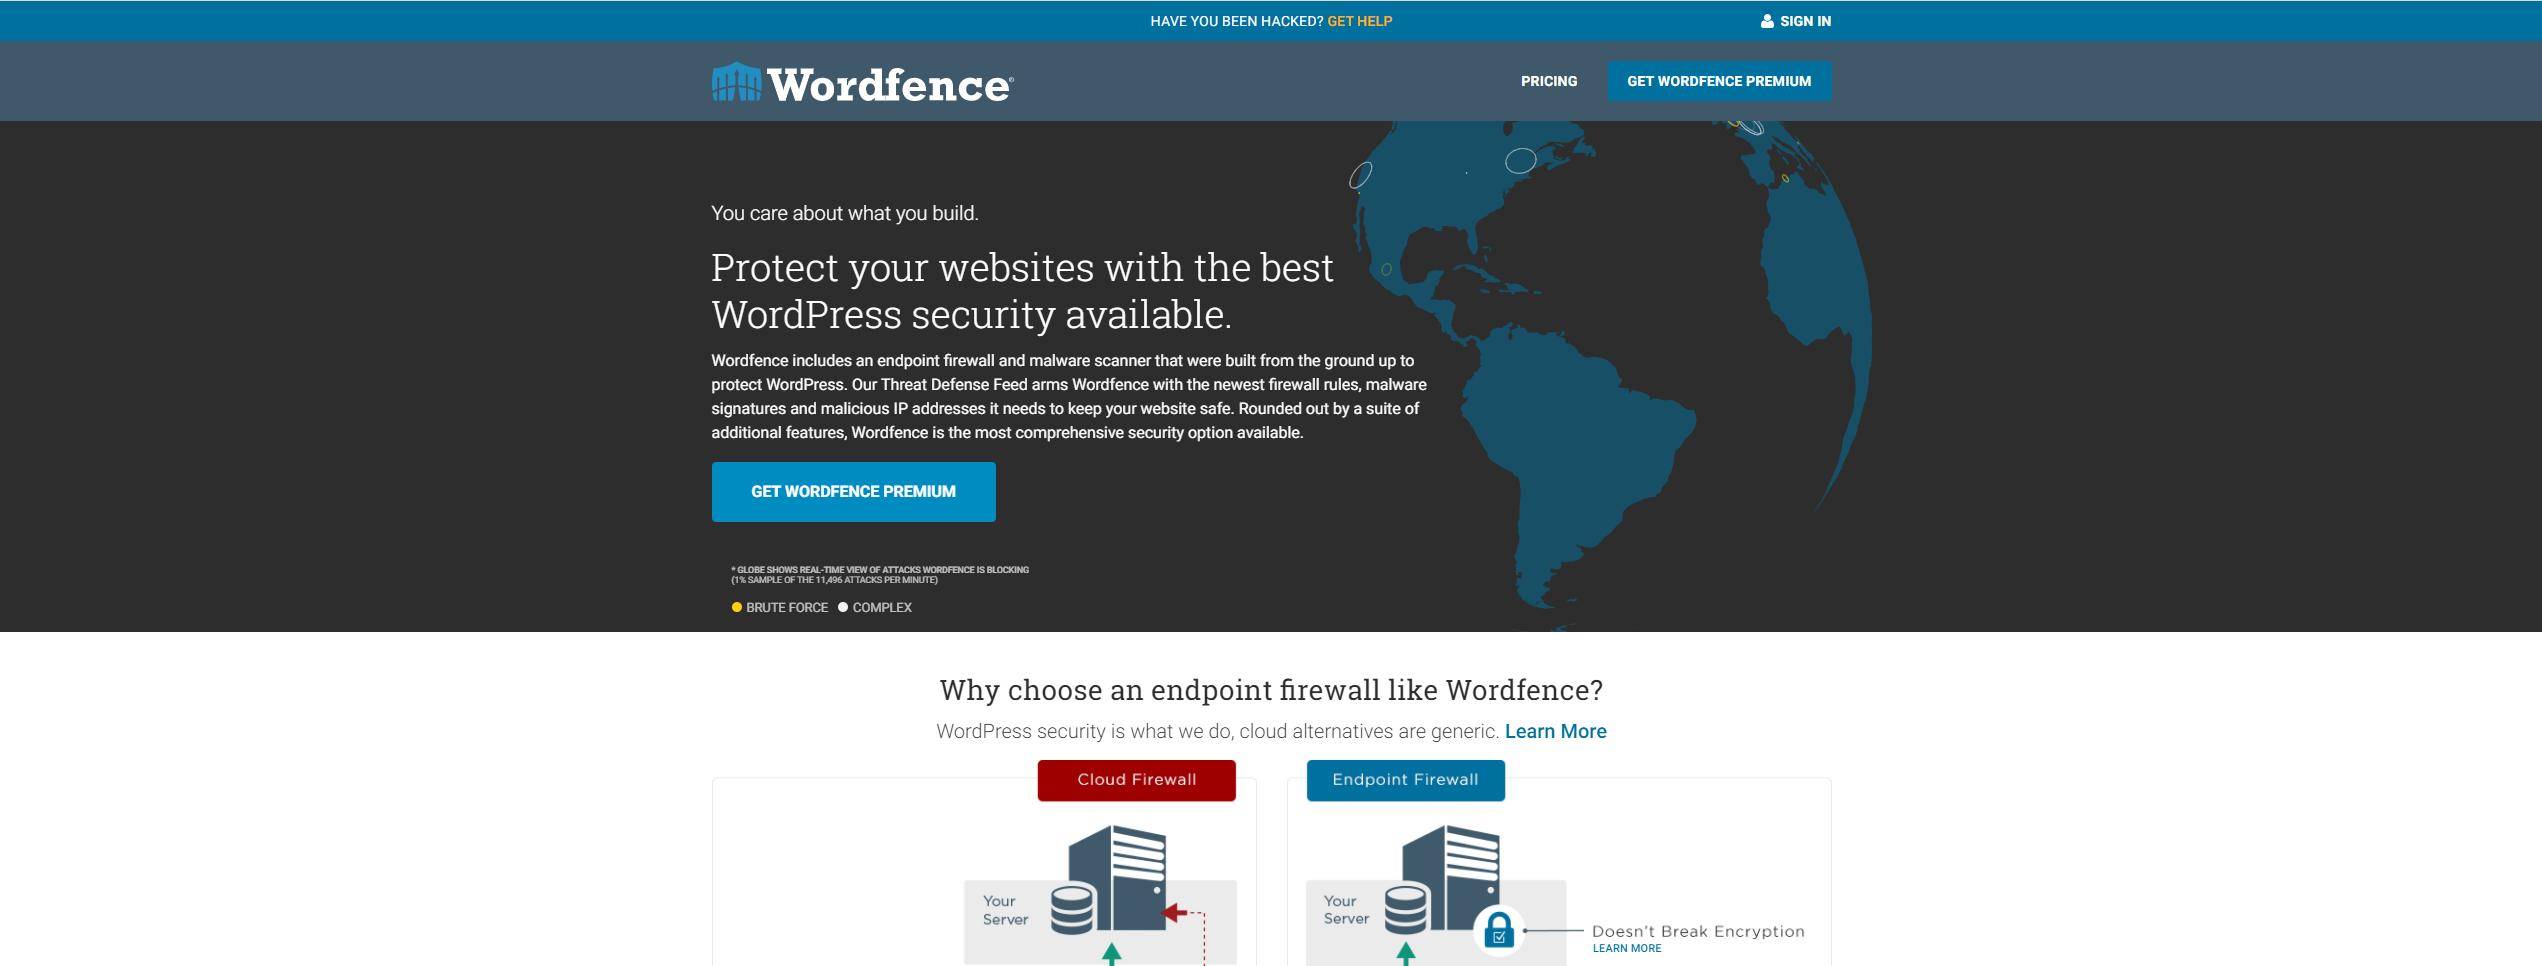 wordfence seguranca wordpress 03